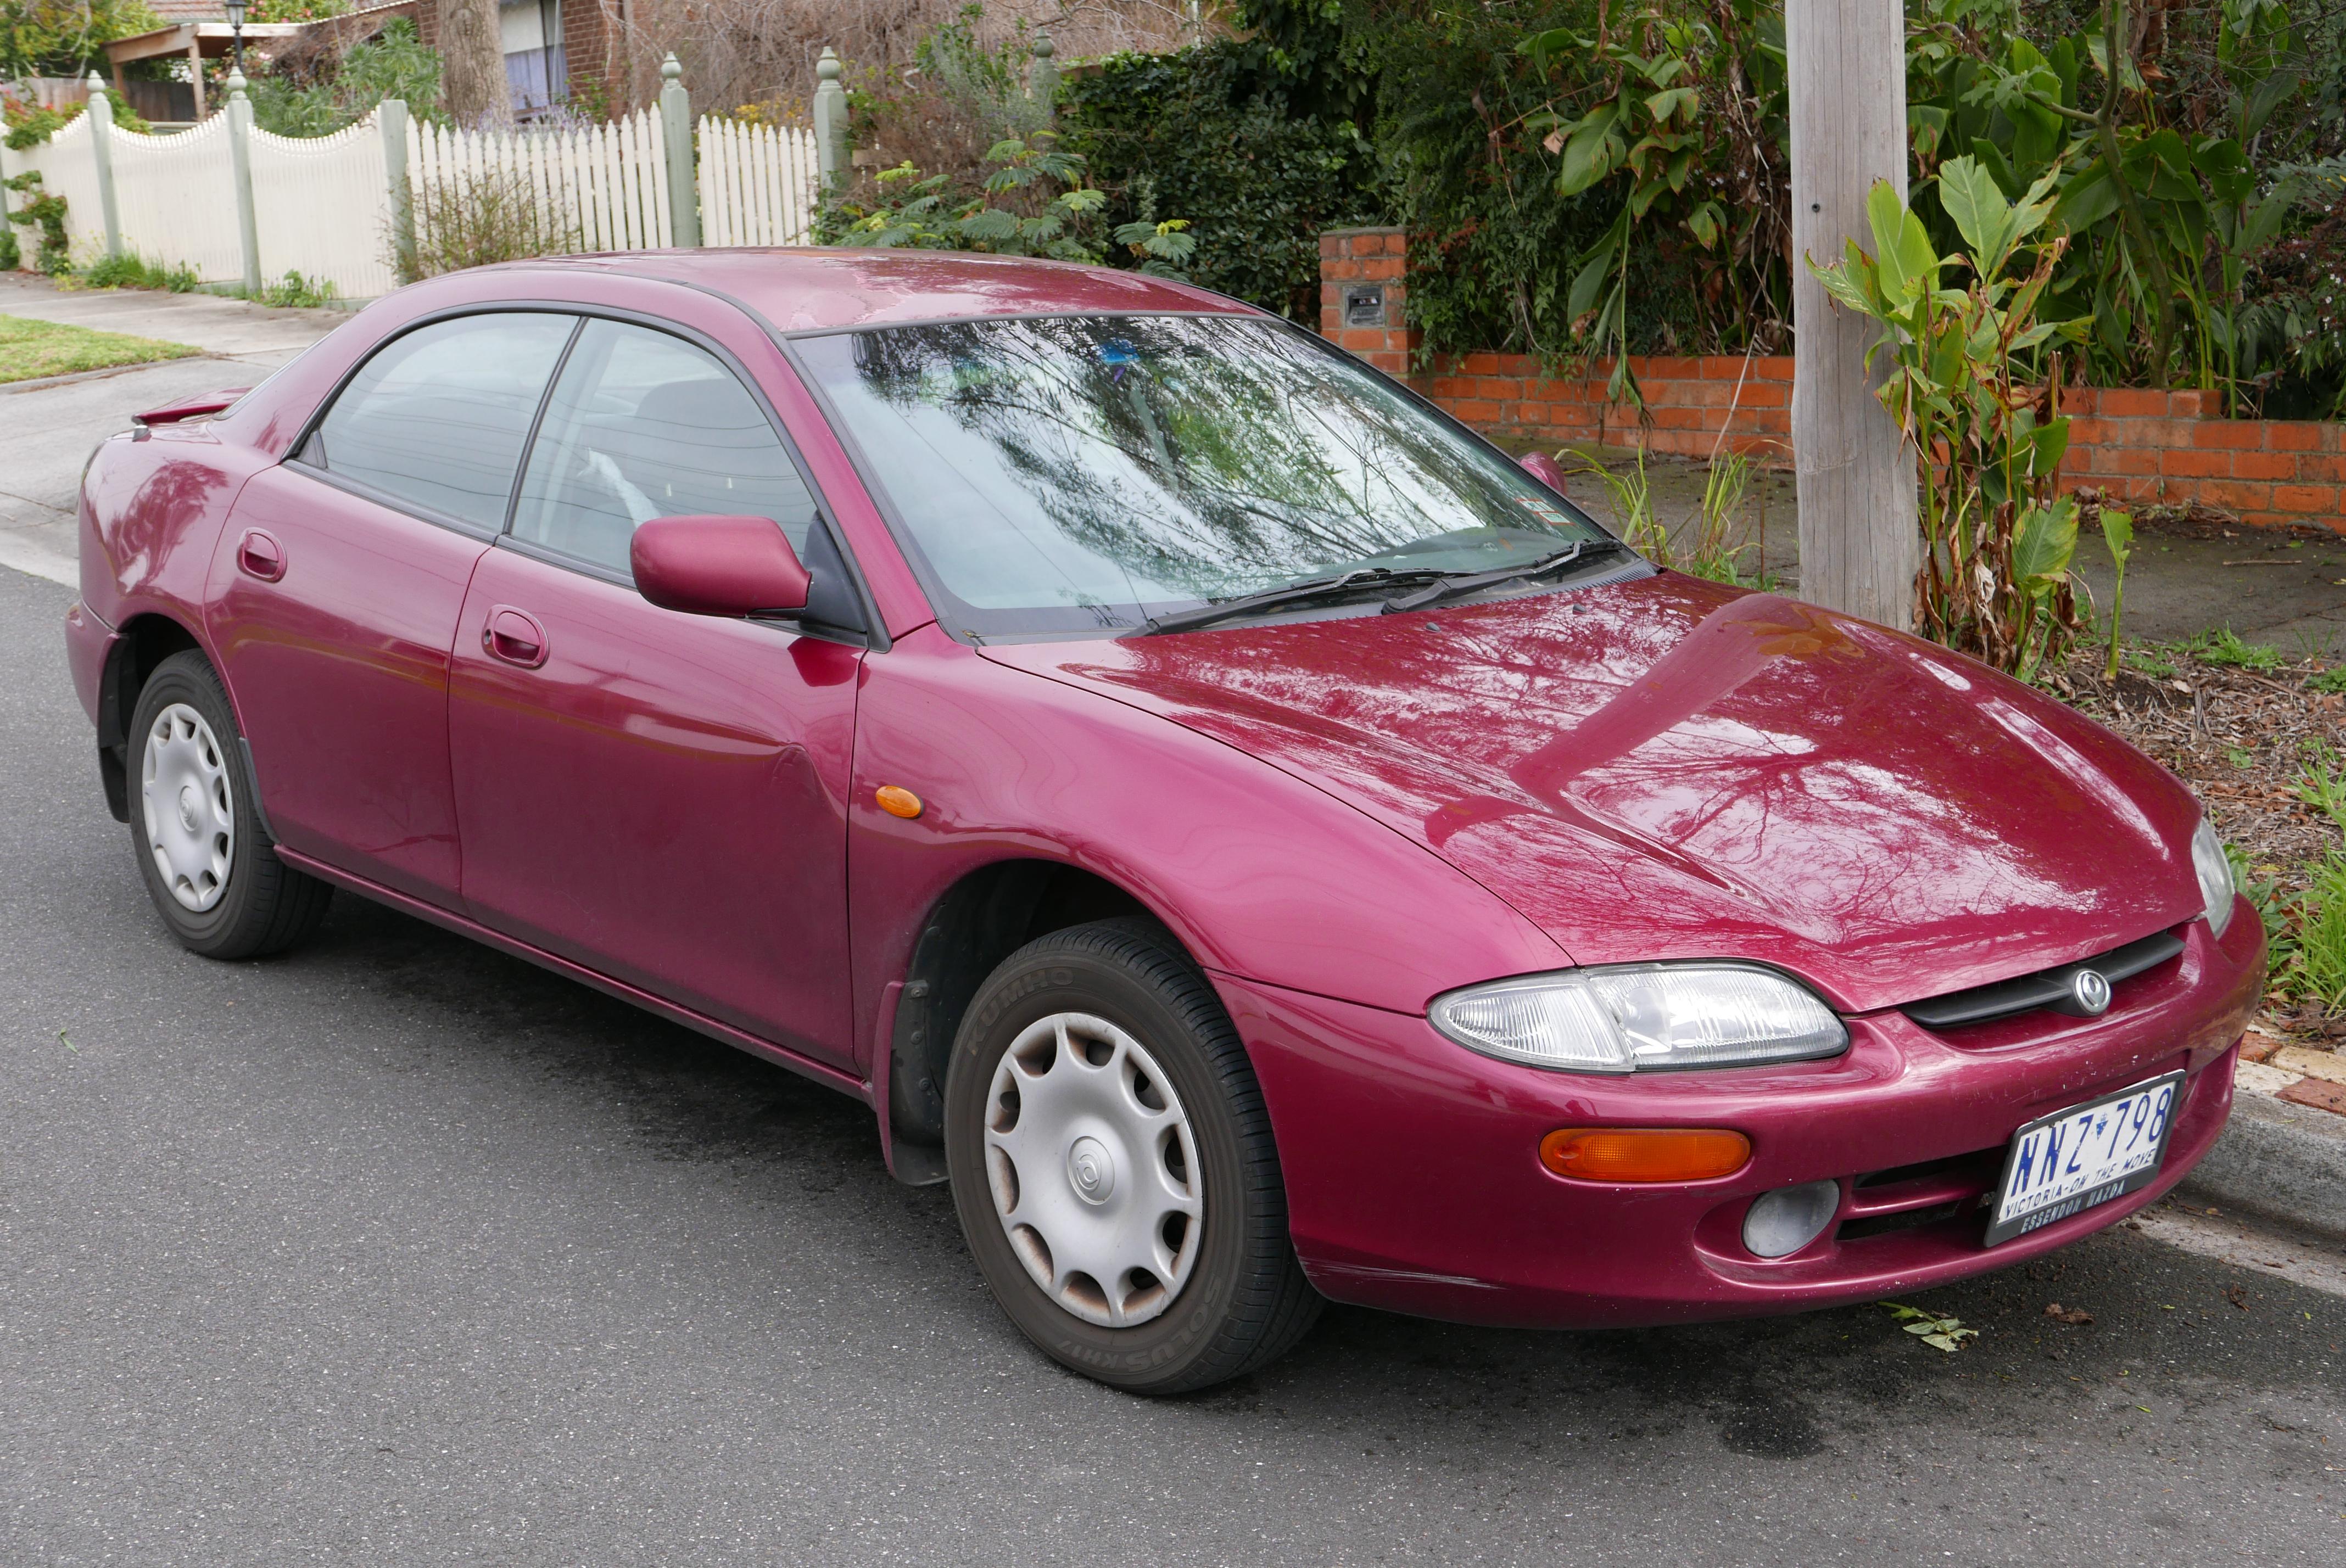 https://upload.wikimedia.org/wikipedia/commons/a/a5/1995_Mazda_323_%28BA%29_Astina_sedan_%282015-08-07%29_01.jpg